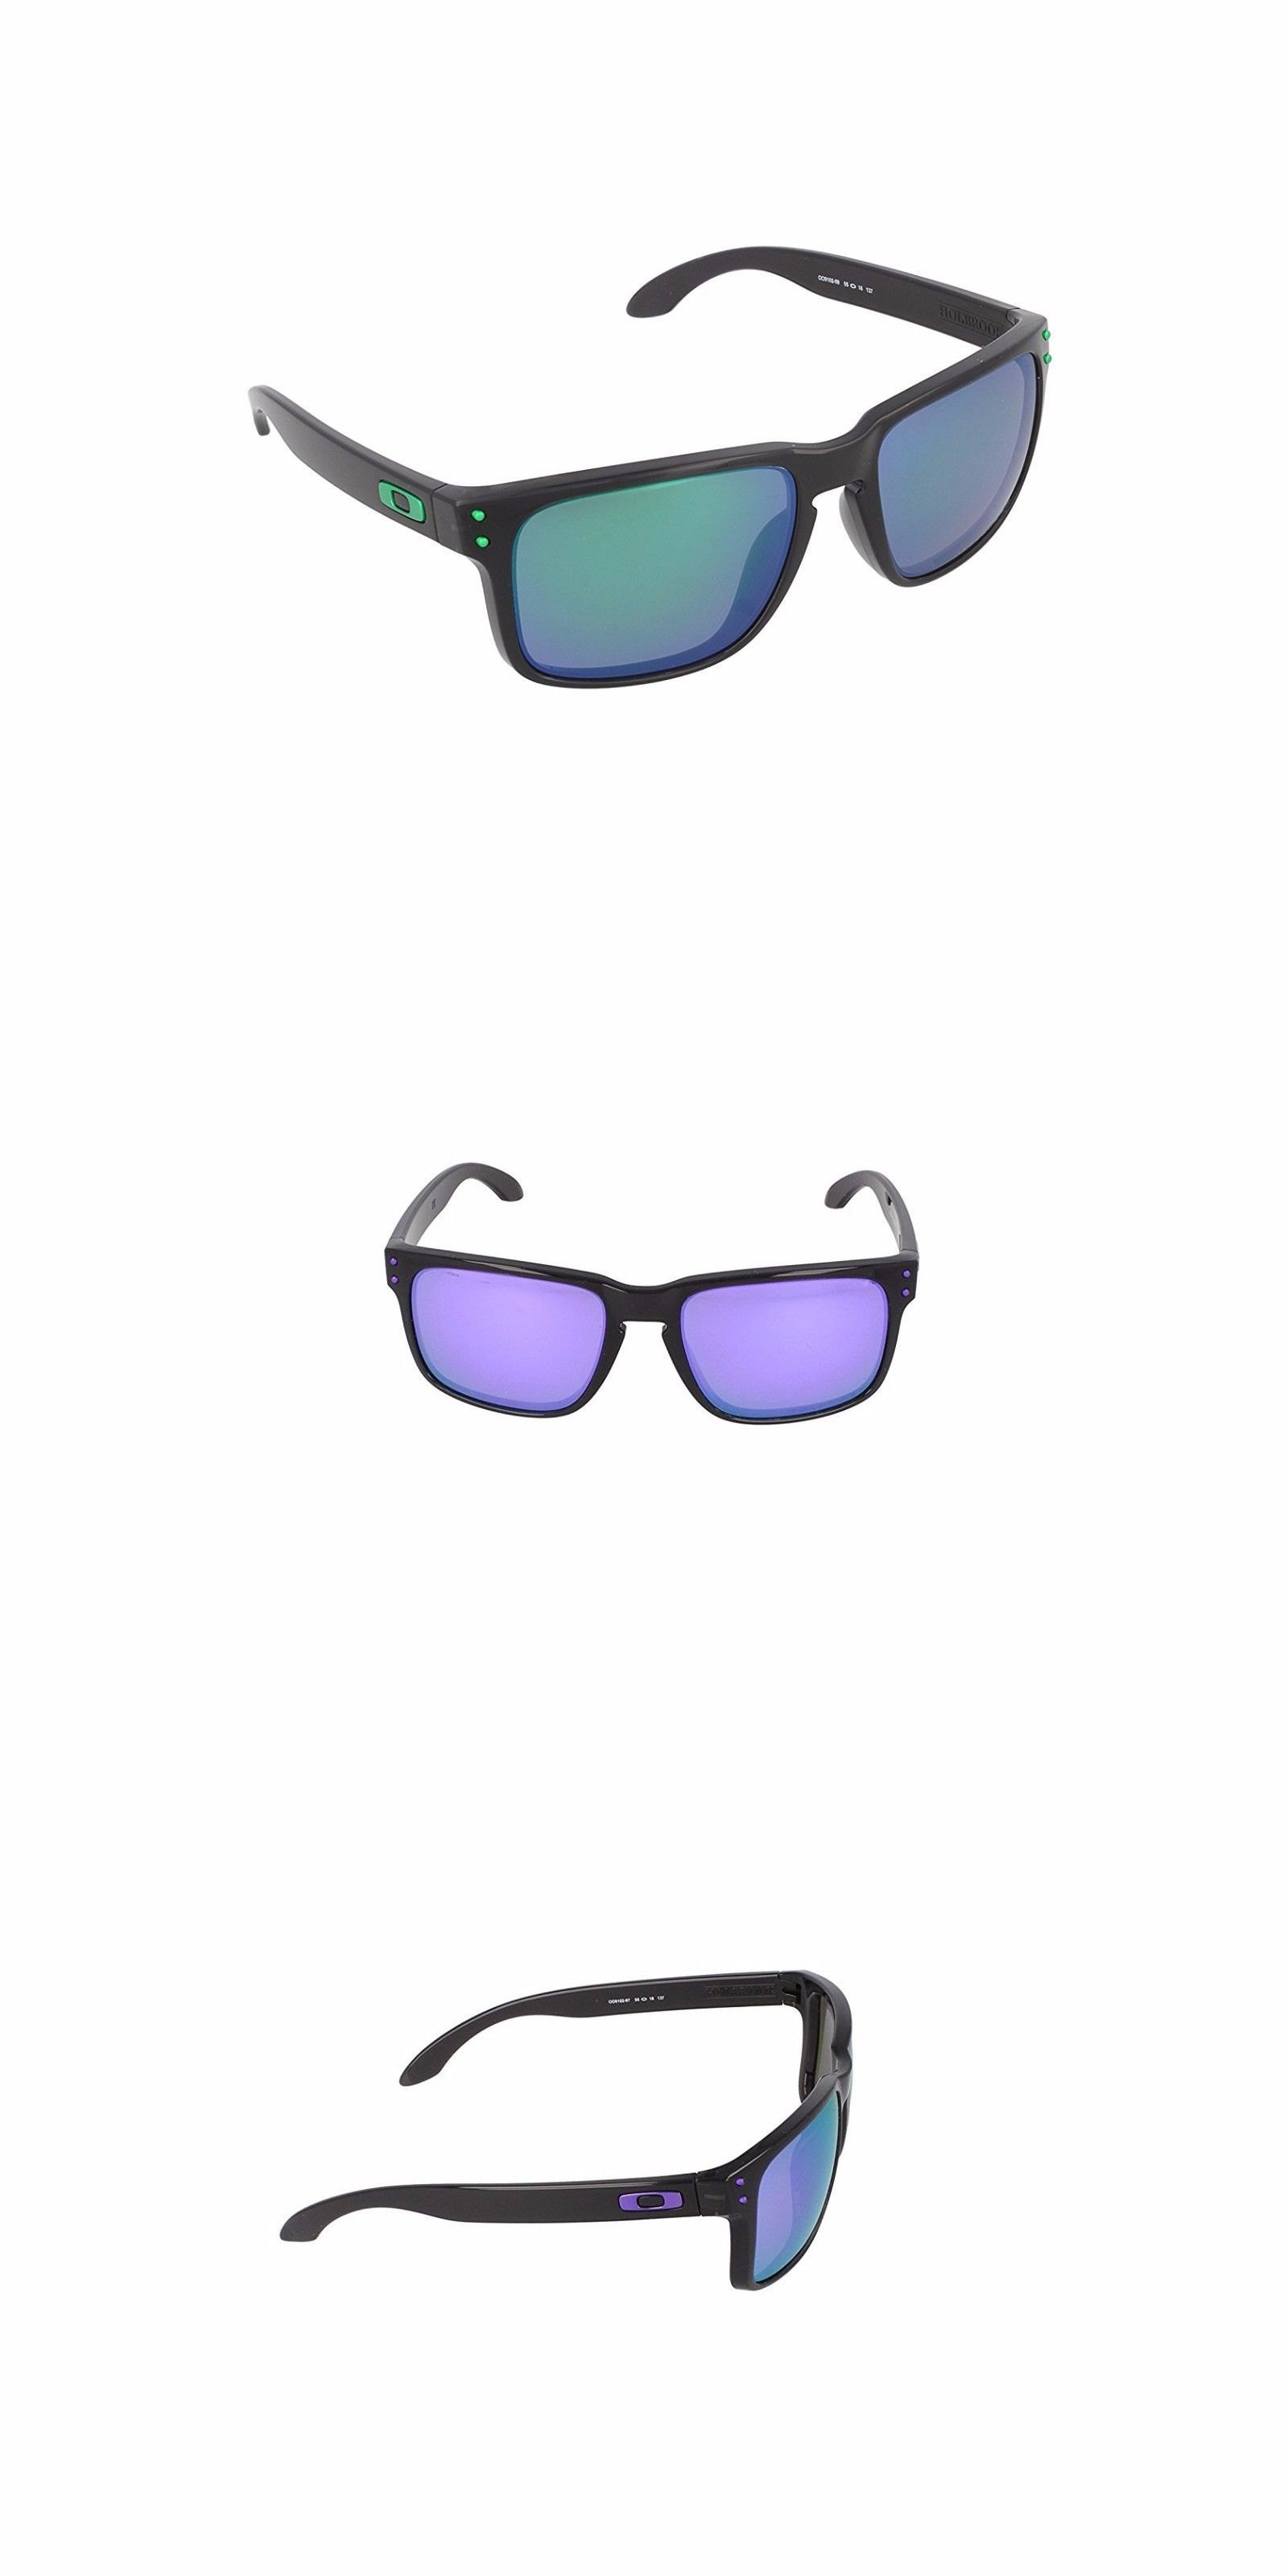 2ba266954358 authentic sunglasses 79720 new oakley holbrook black ink frame w violet  iridium polarized lens oo9102 85994